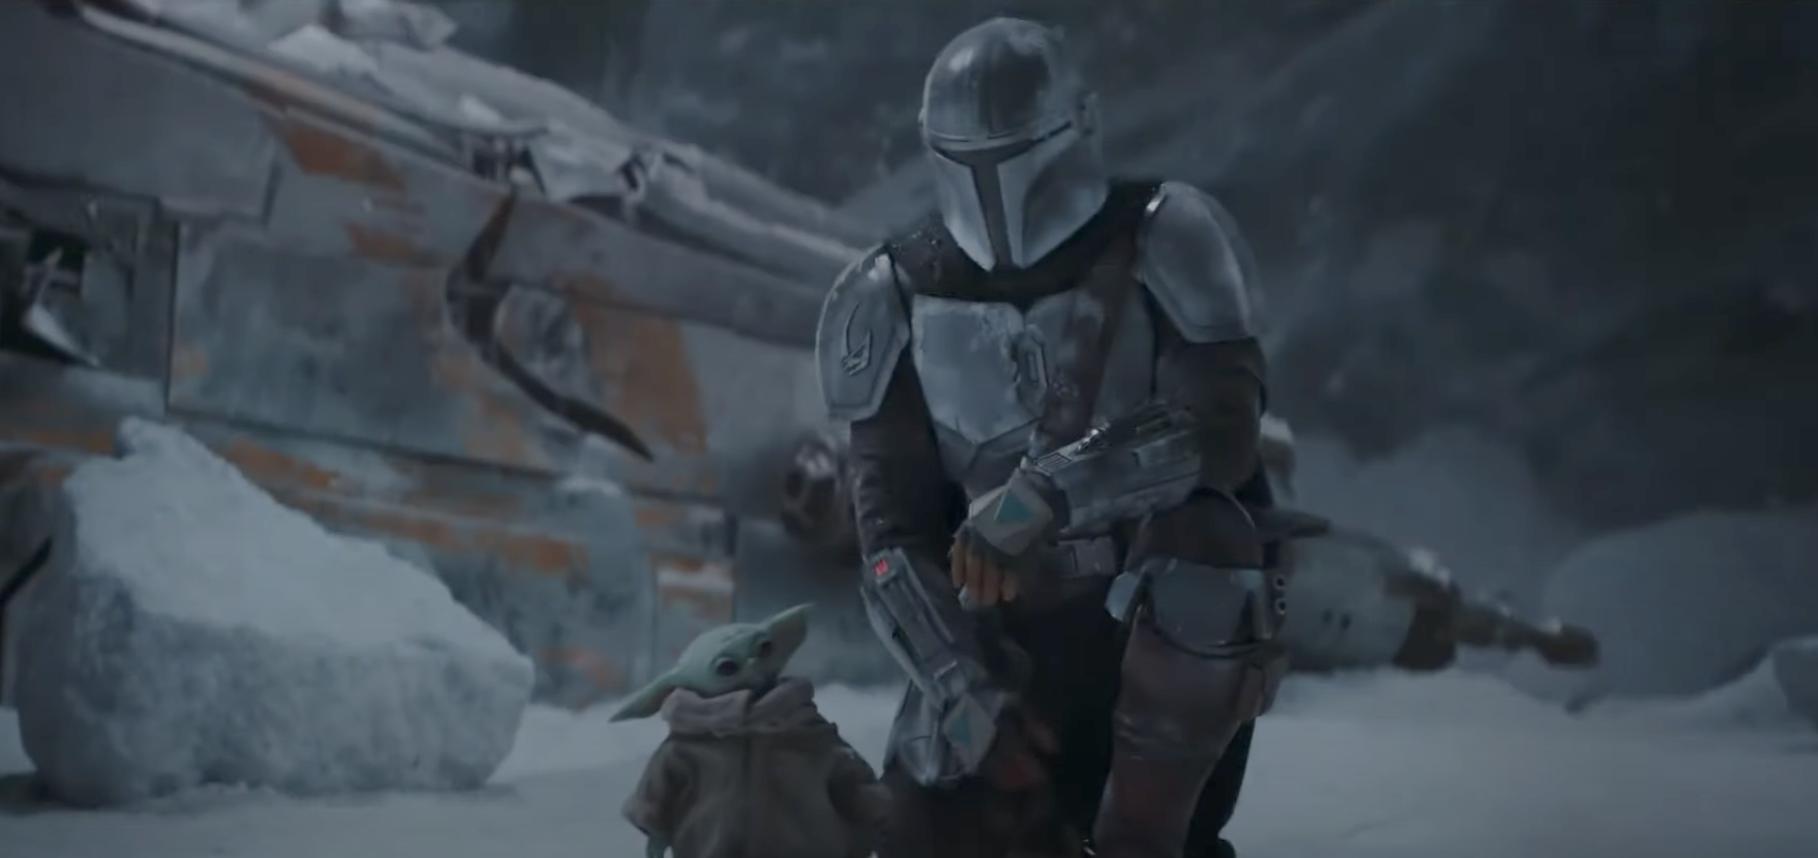 The Mandalorian kneels next to Baby Yoda